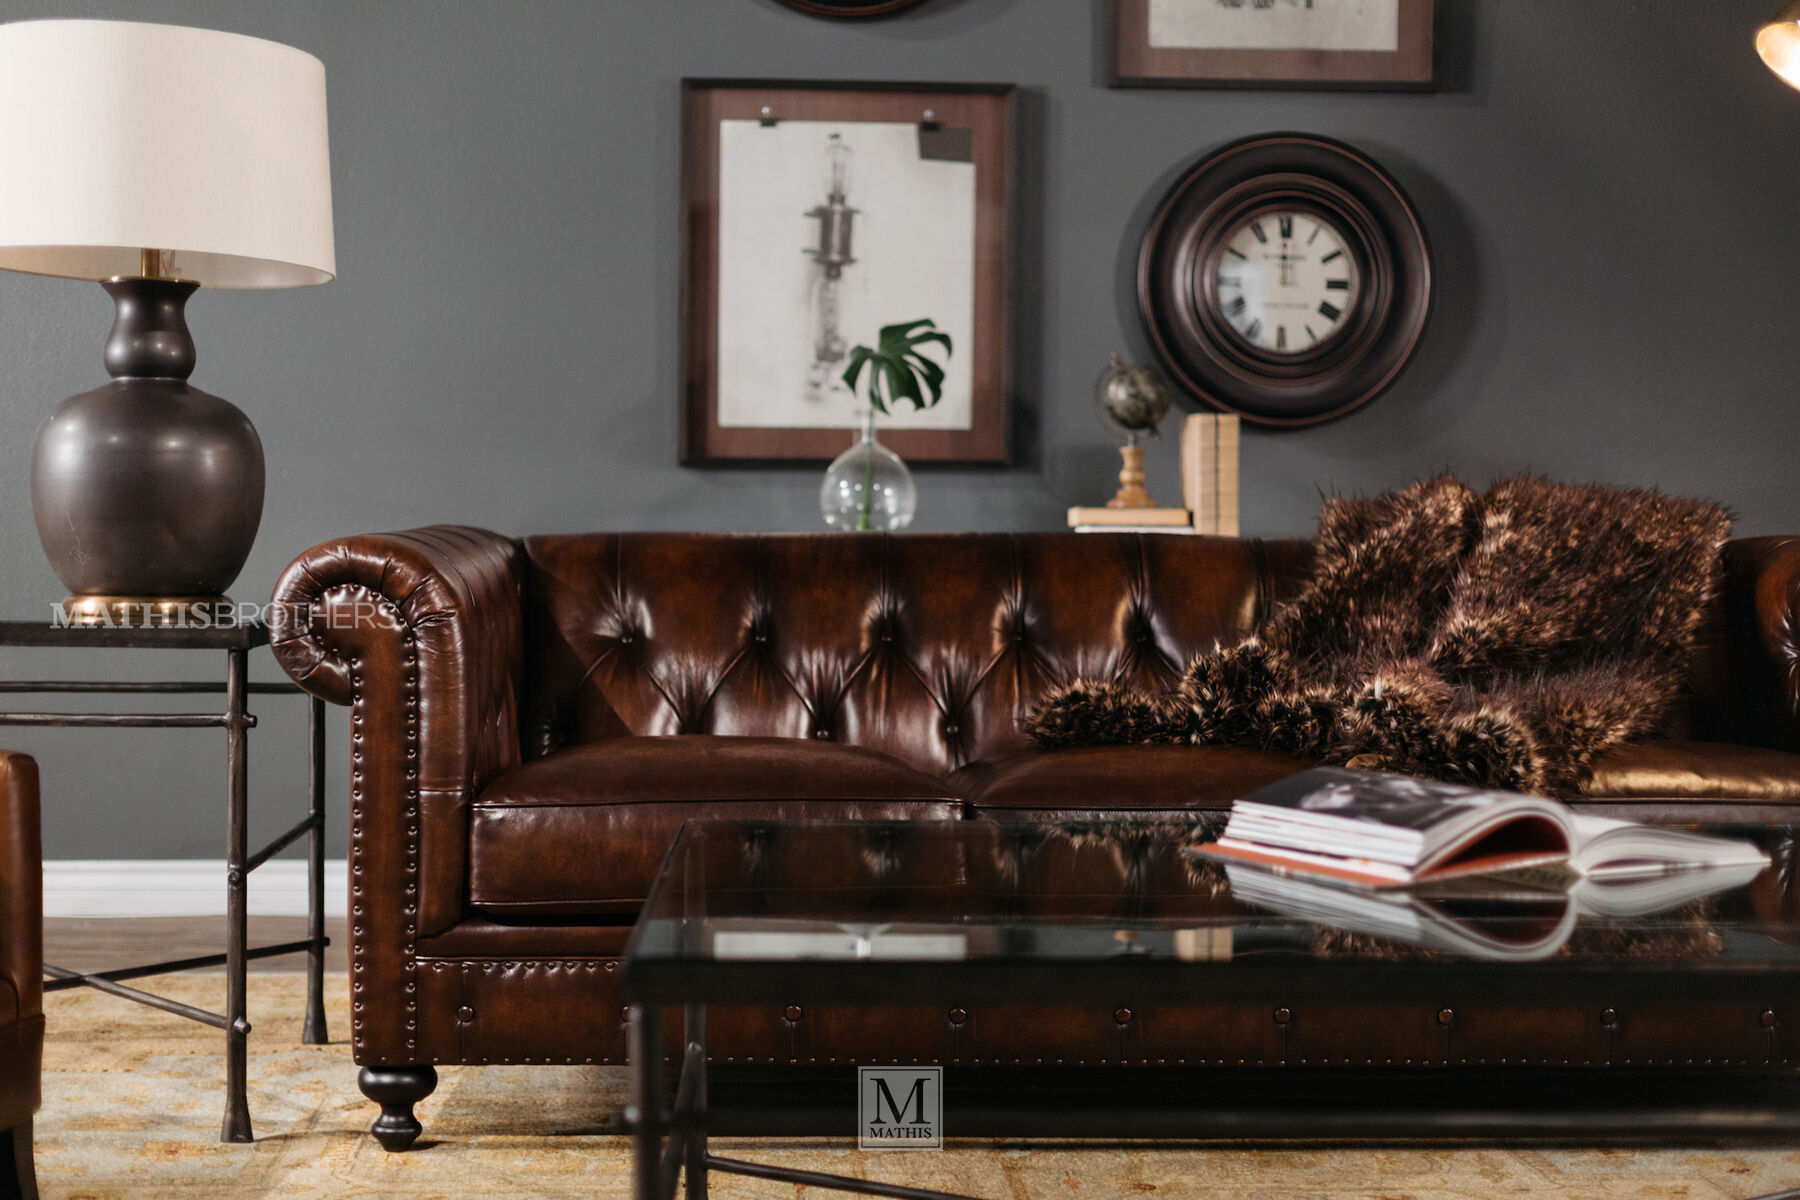 bernhardt brown leather club chair royal botania alura london dark sofa mathis